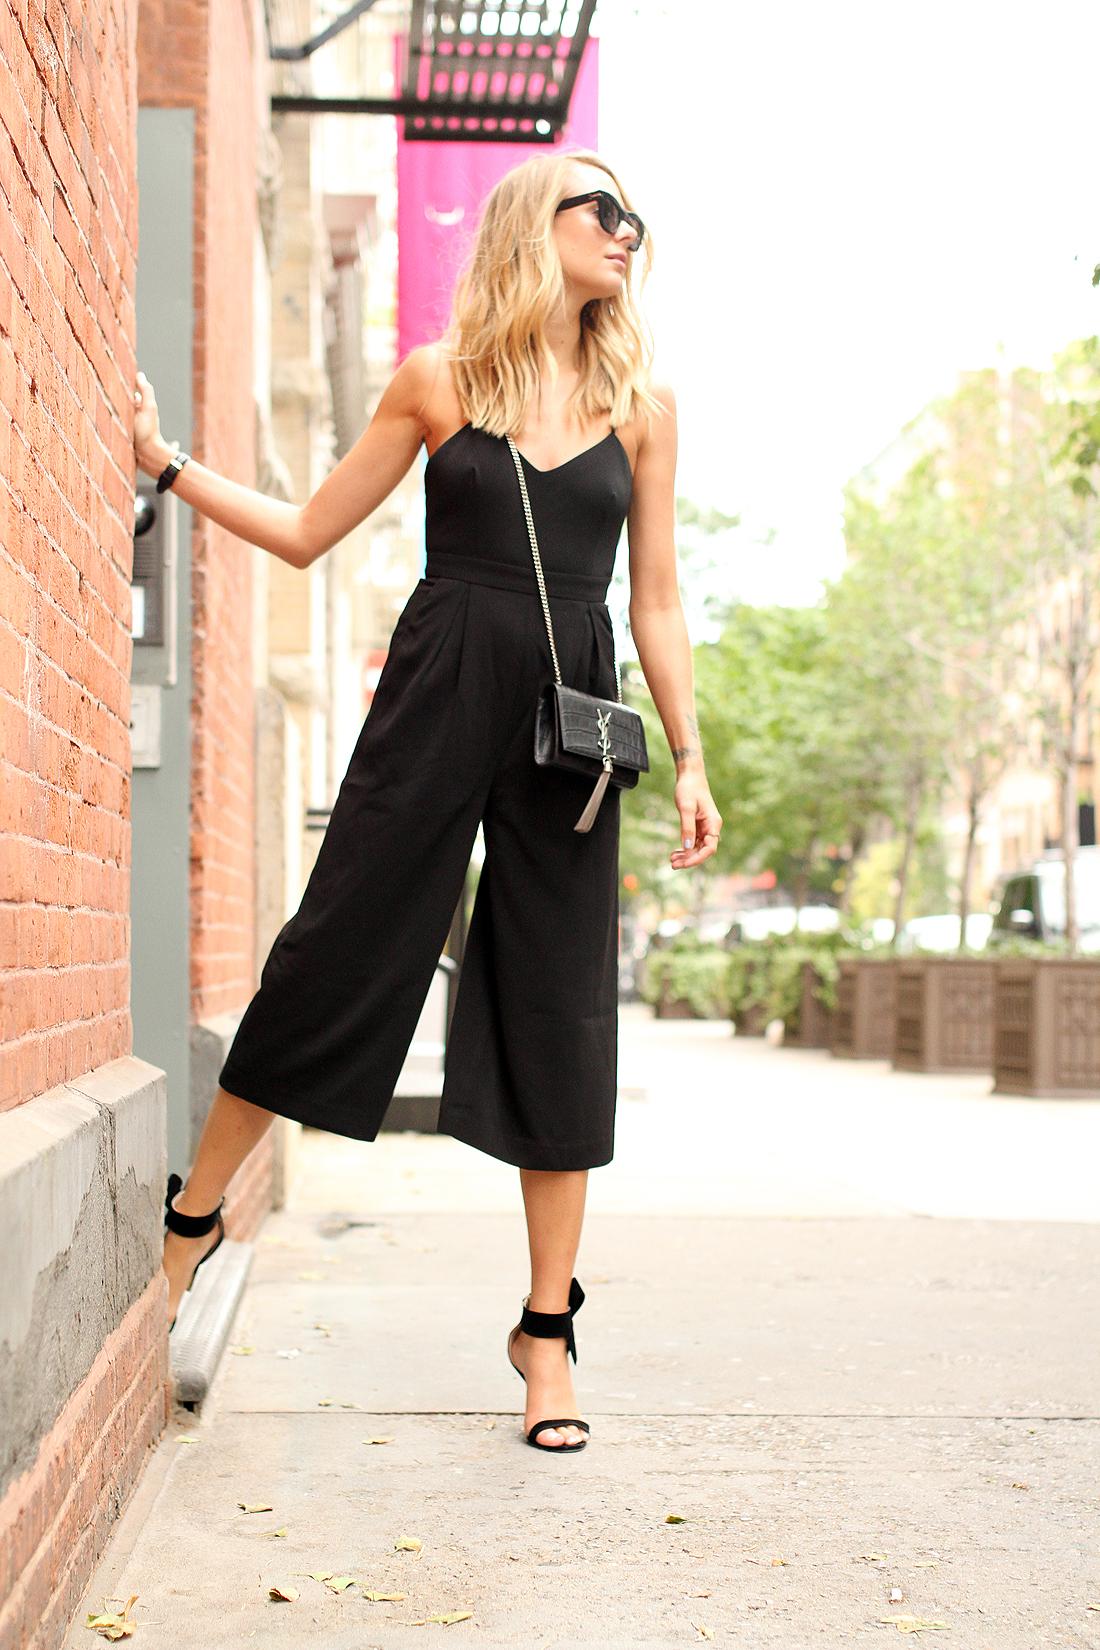 fashion-jackson-celine-black-sunglasses-cameo-power-trip-jumpsuit-saint-laurent-cassandre-crossbody-handbag-black-bow-heels-street-style-nyfw